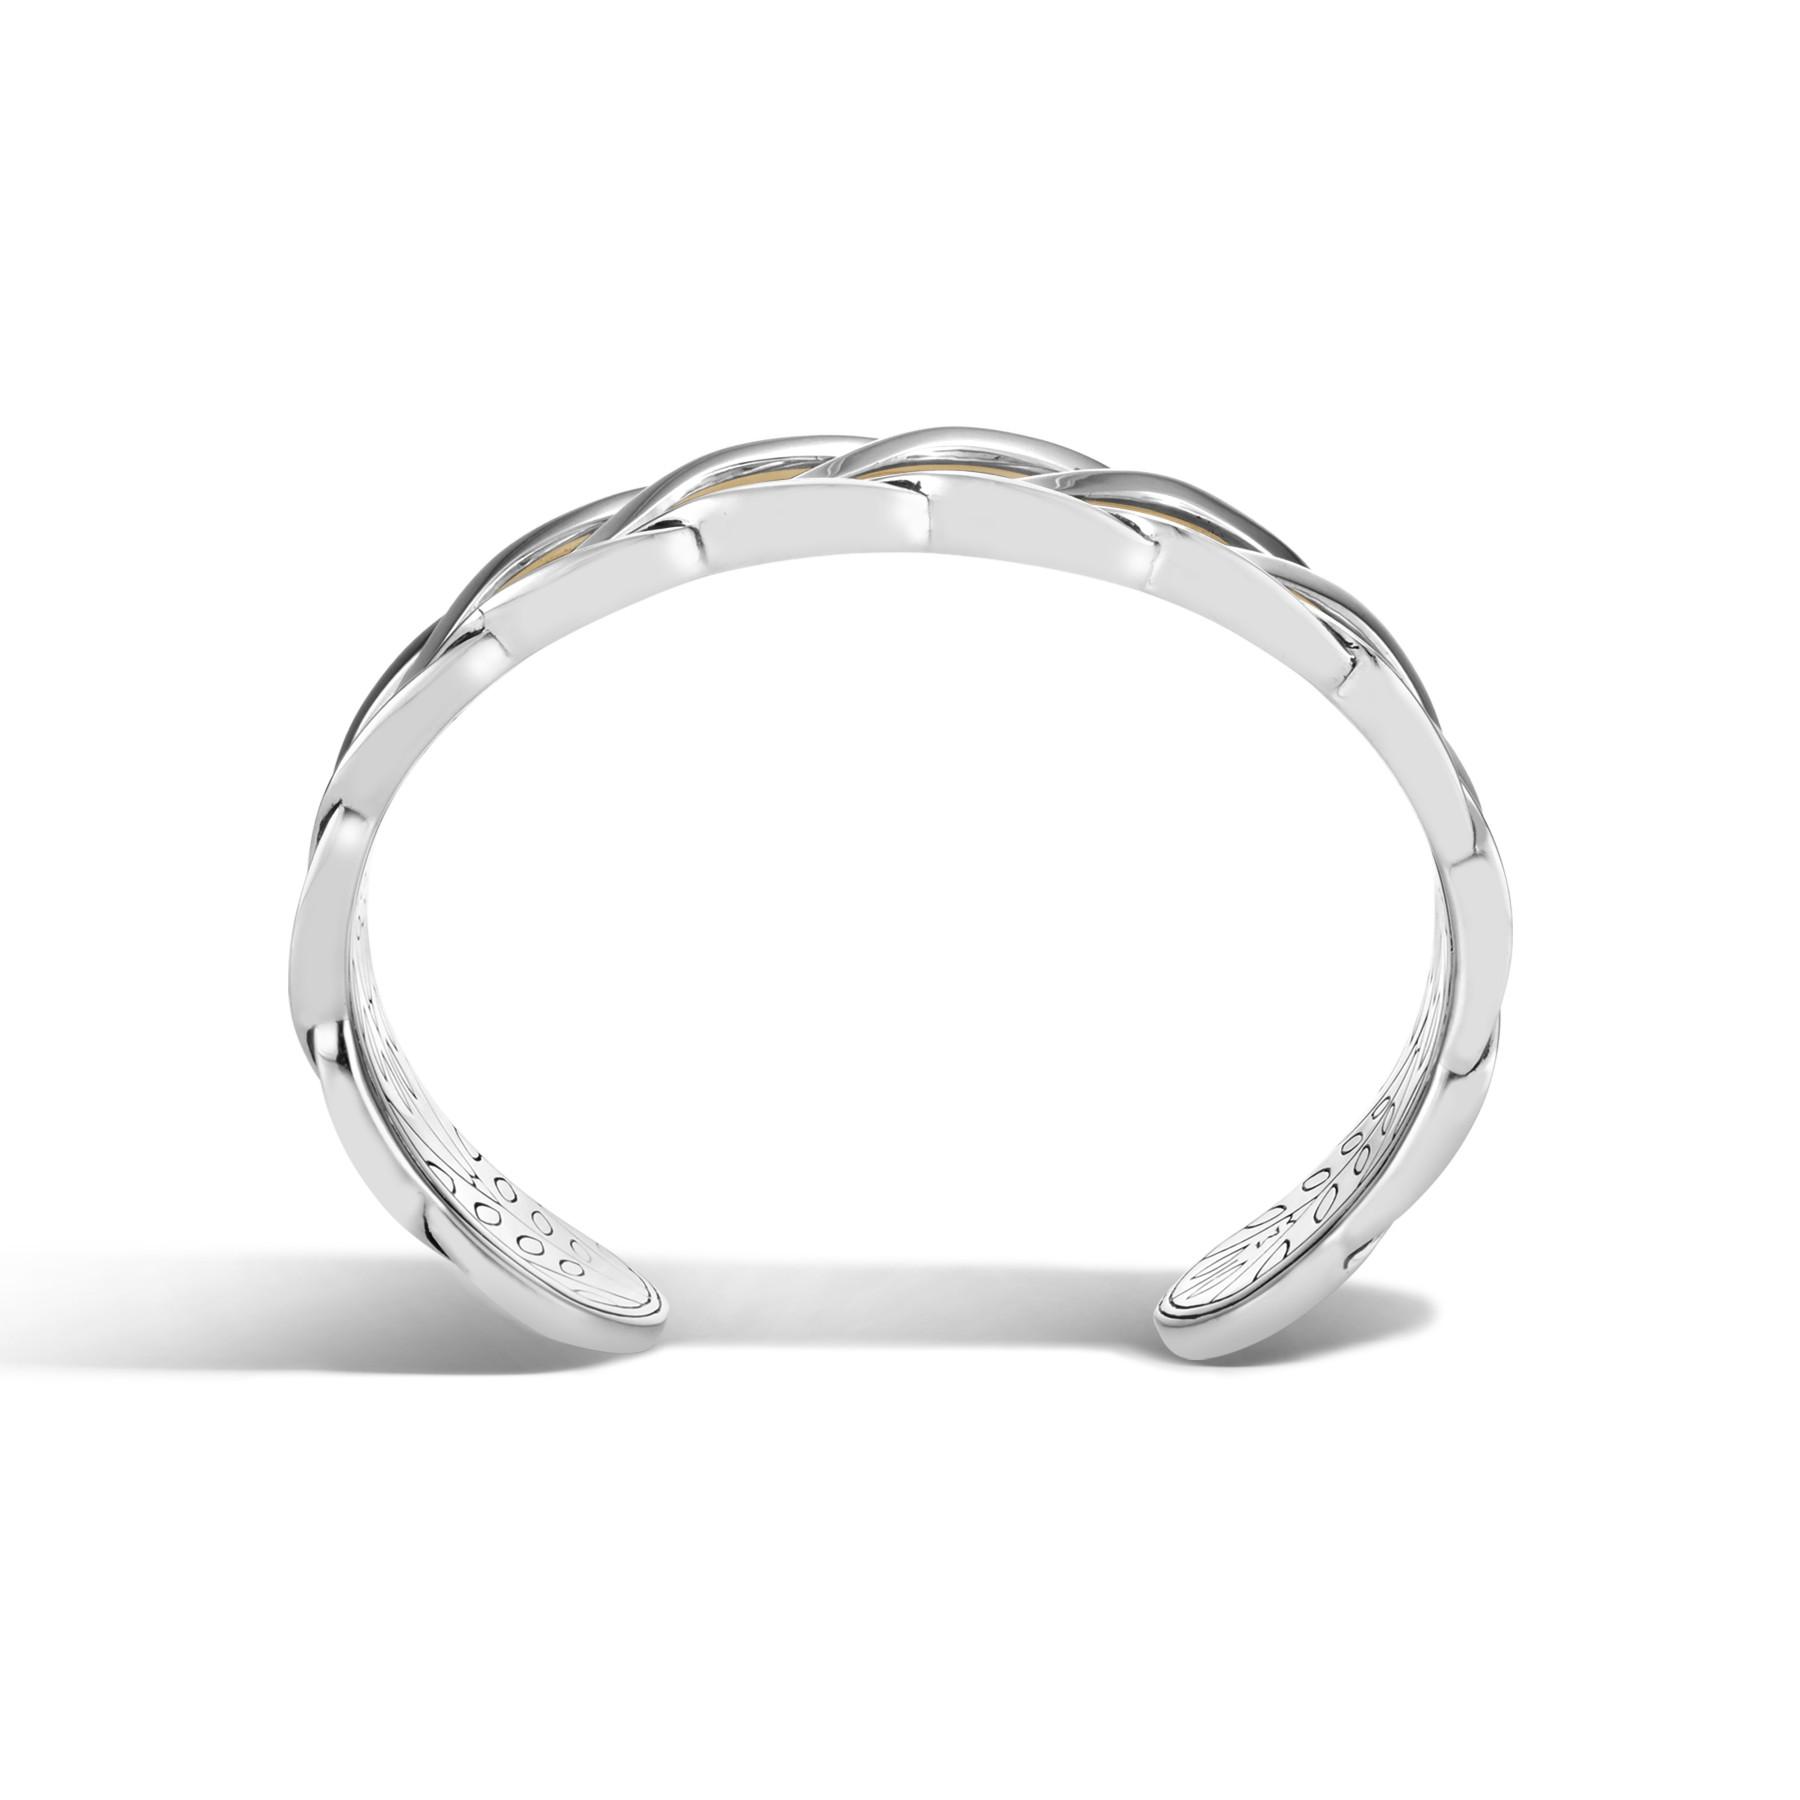 John Hardy Modern Chain Two-Tone Cuff Bracelet side view